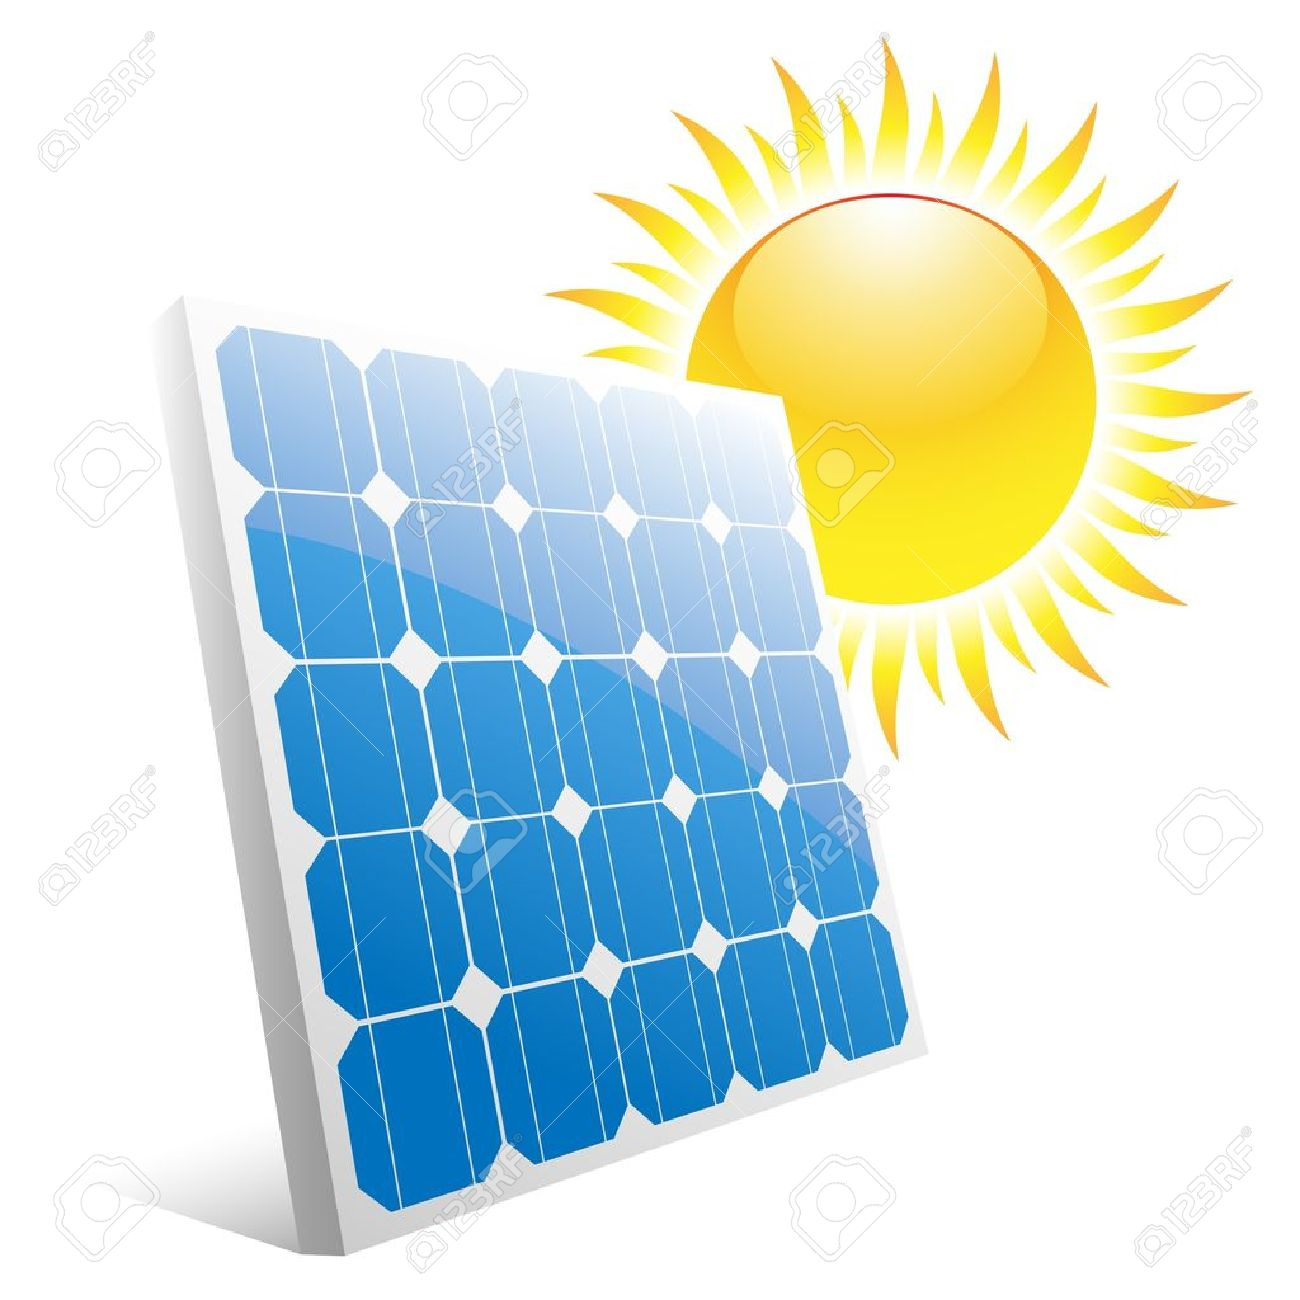 1300x1300 Solar Sun Clipart, Explore Pictures